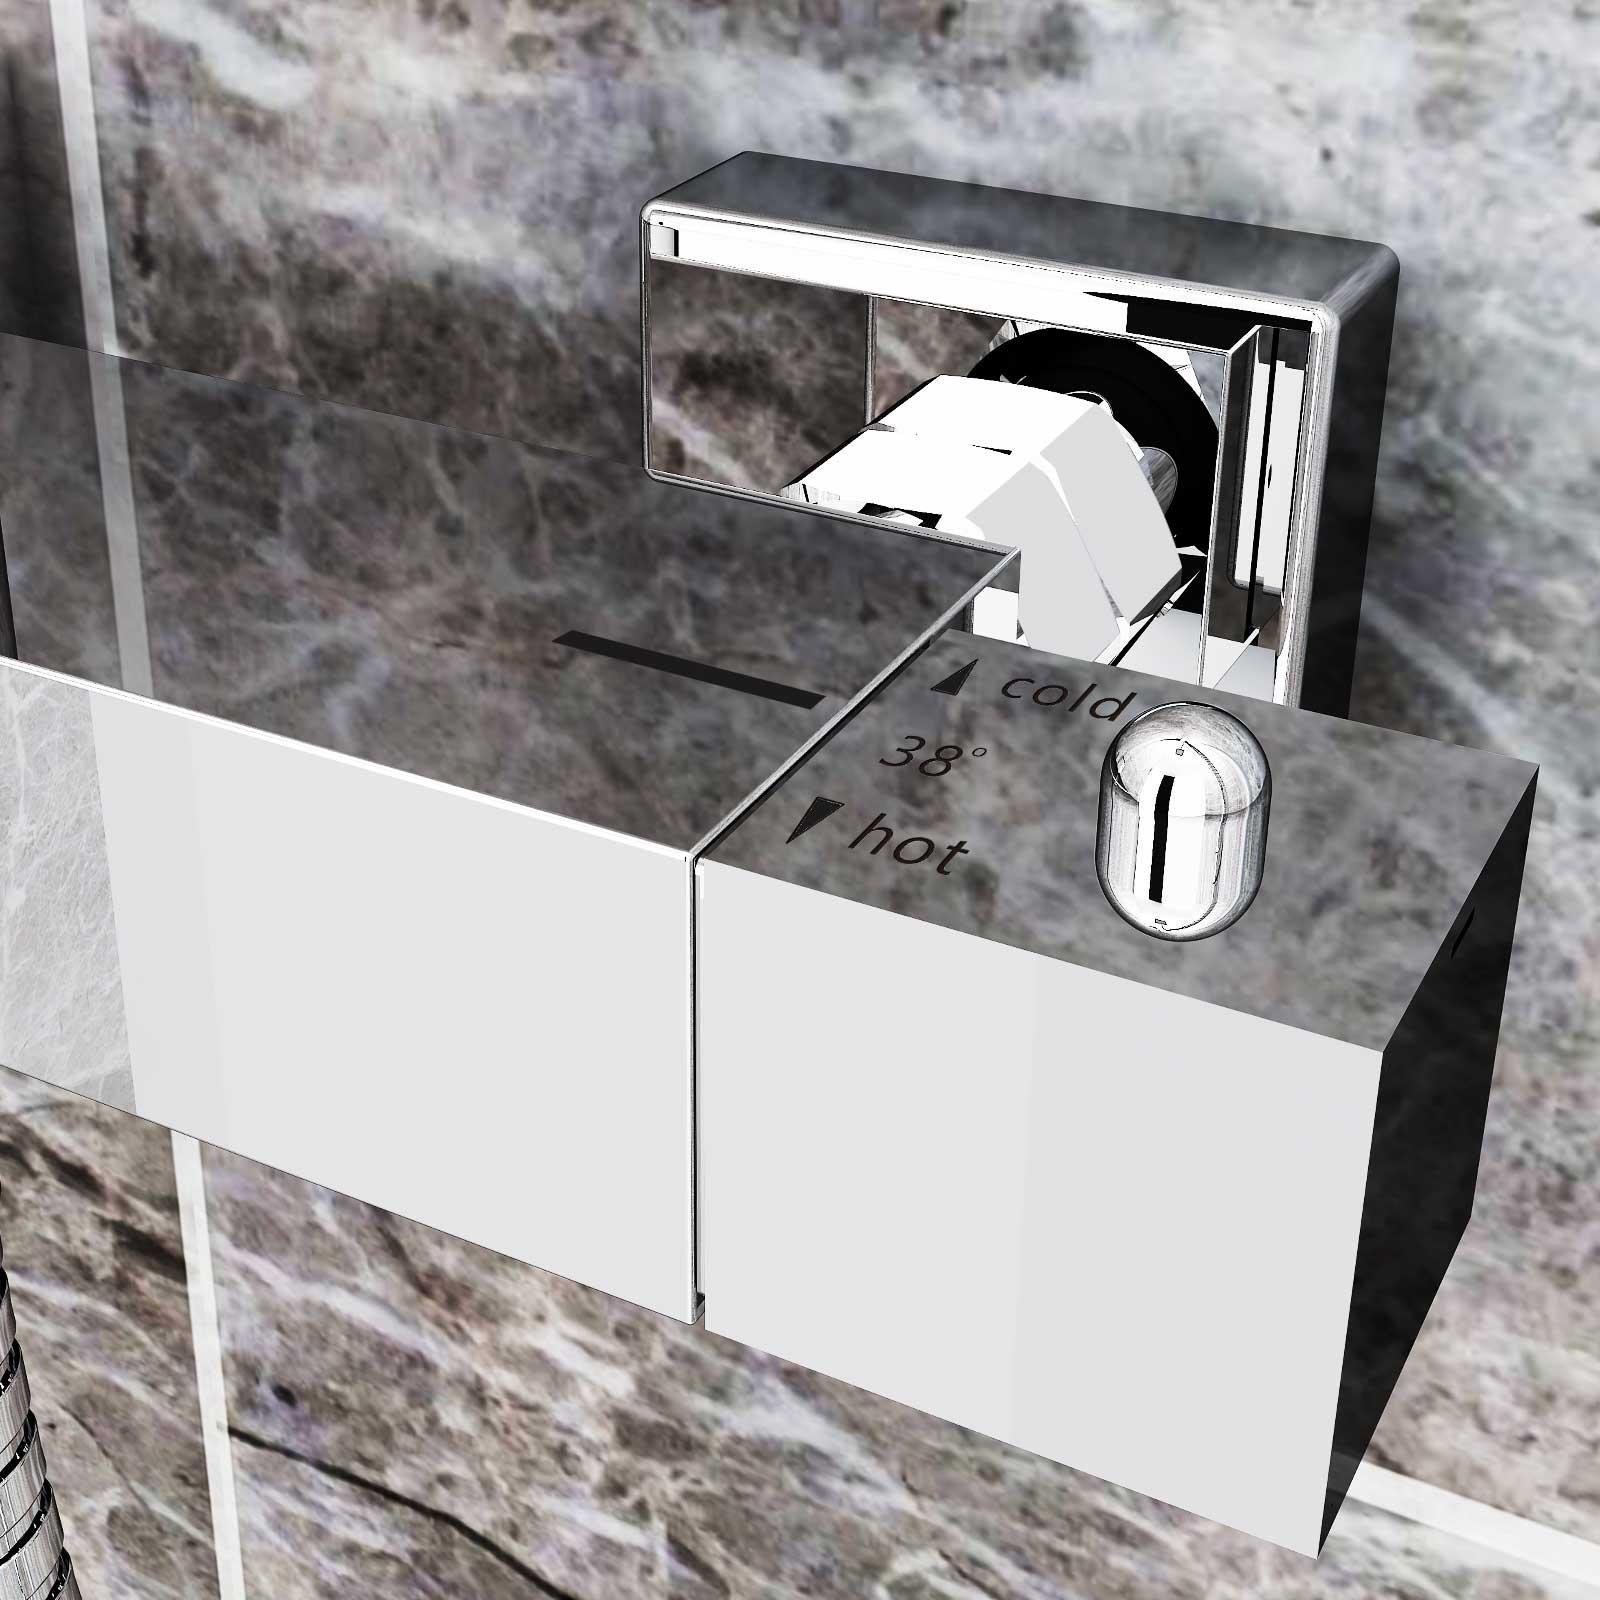 Nischent?r Dusche Verstellbar : Duschset Chrom Quadratisch Duschsystem Duscharmatur ?berkopfbrause